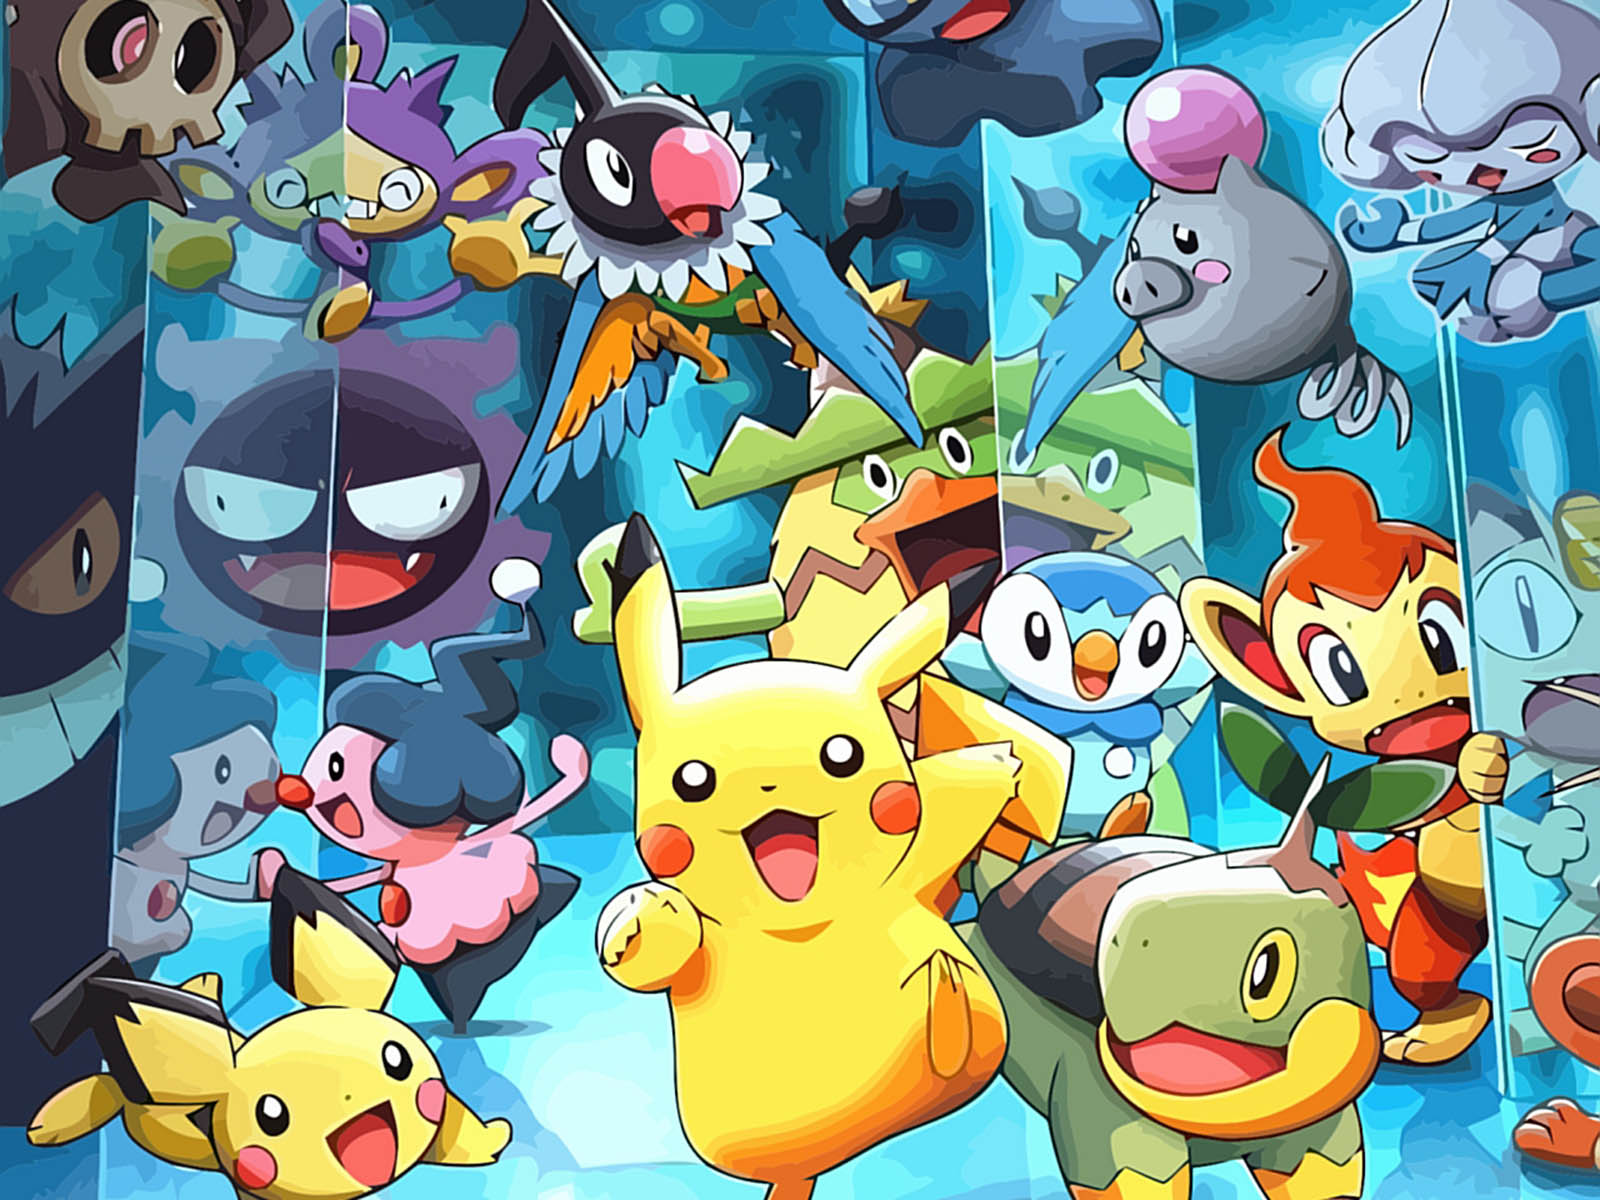 Pokemon Wallpaper for Desktop - WallpaperSafari